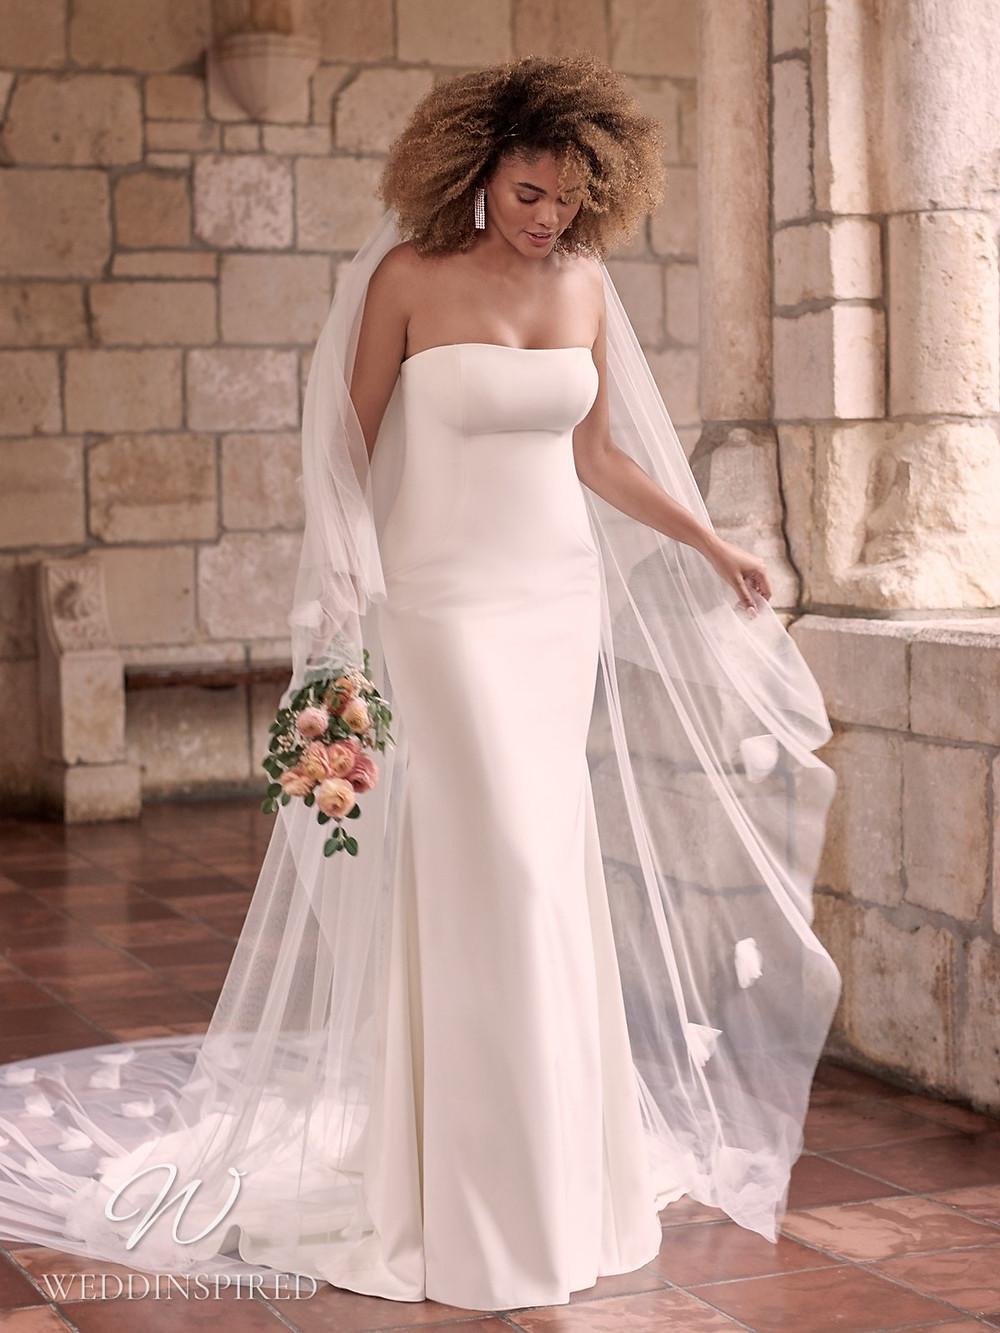 A Maggie Sottero Spring 2021 simple strapless satin mermaid wedding dress